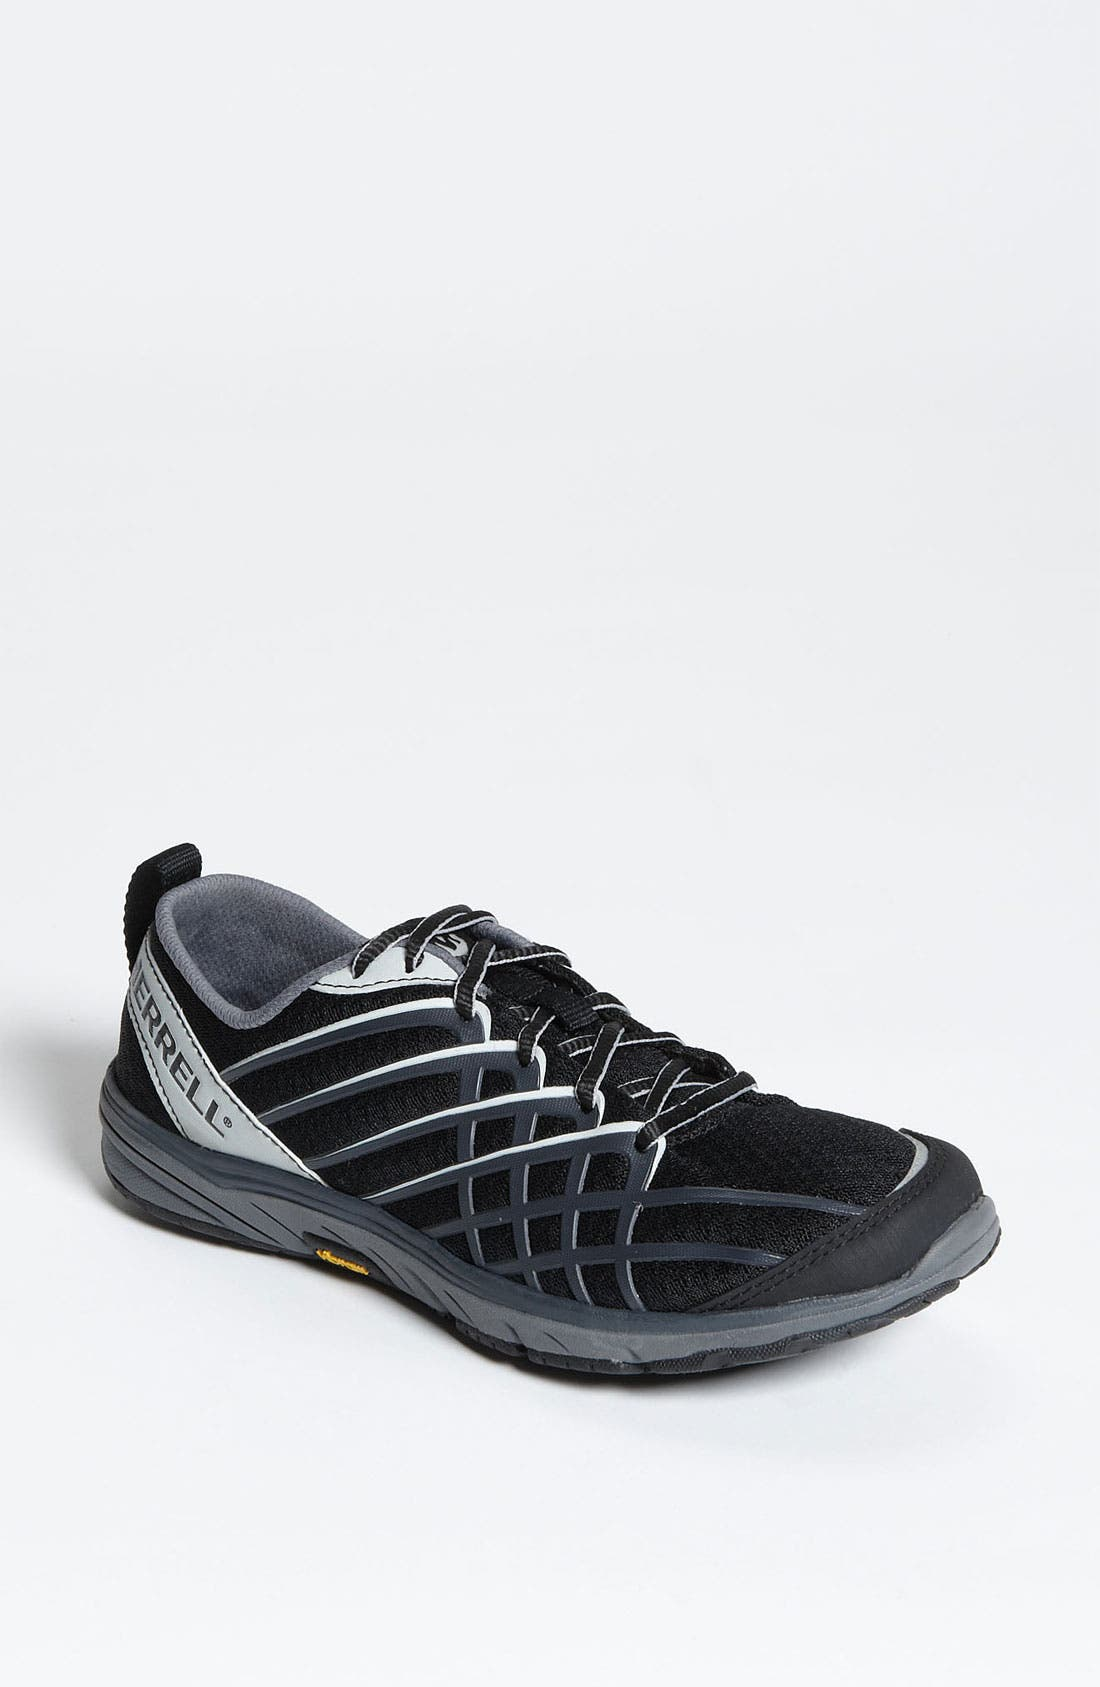 Main Image - Merrell 'Bare Access Arc 2' Running Shoe (Women)